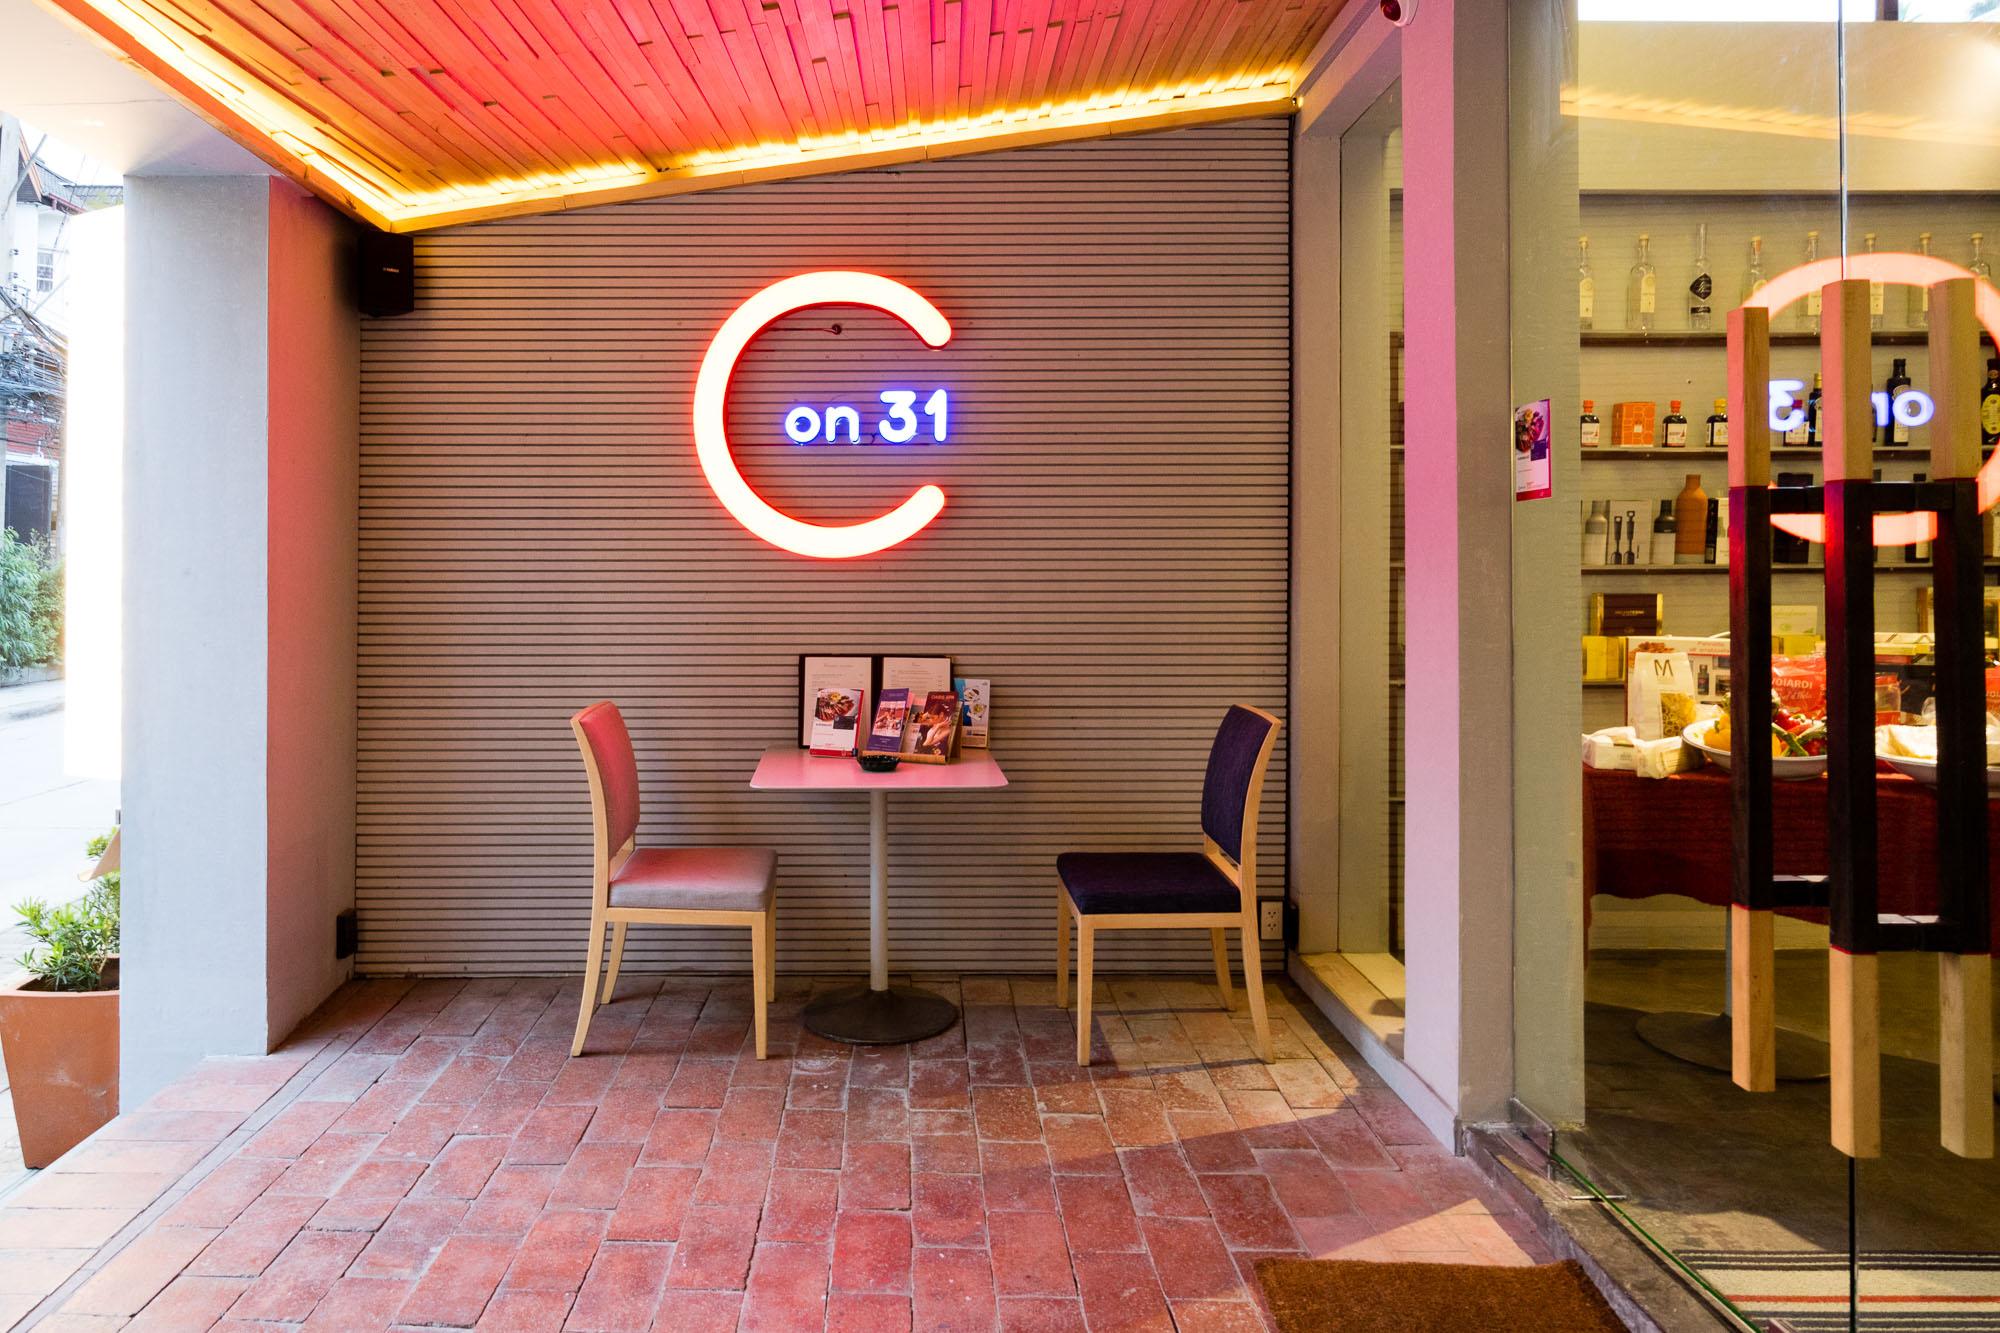 Calderazzo on 31  Calderazzo on 31 ร้านอาหารอิตาเลี่ยนแท้ ย่านสุขุมวิท ที่แนะนำให้มาลอง p79aqk95s5tszN5Mb4y o